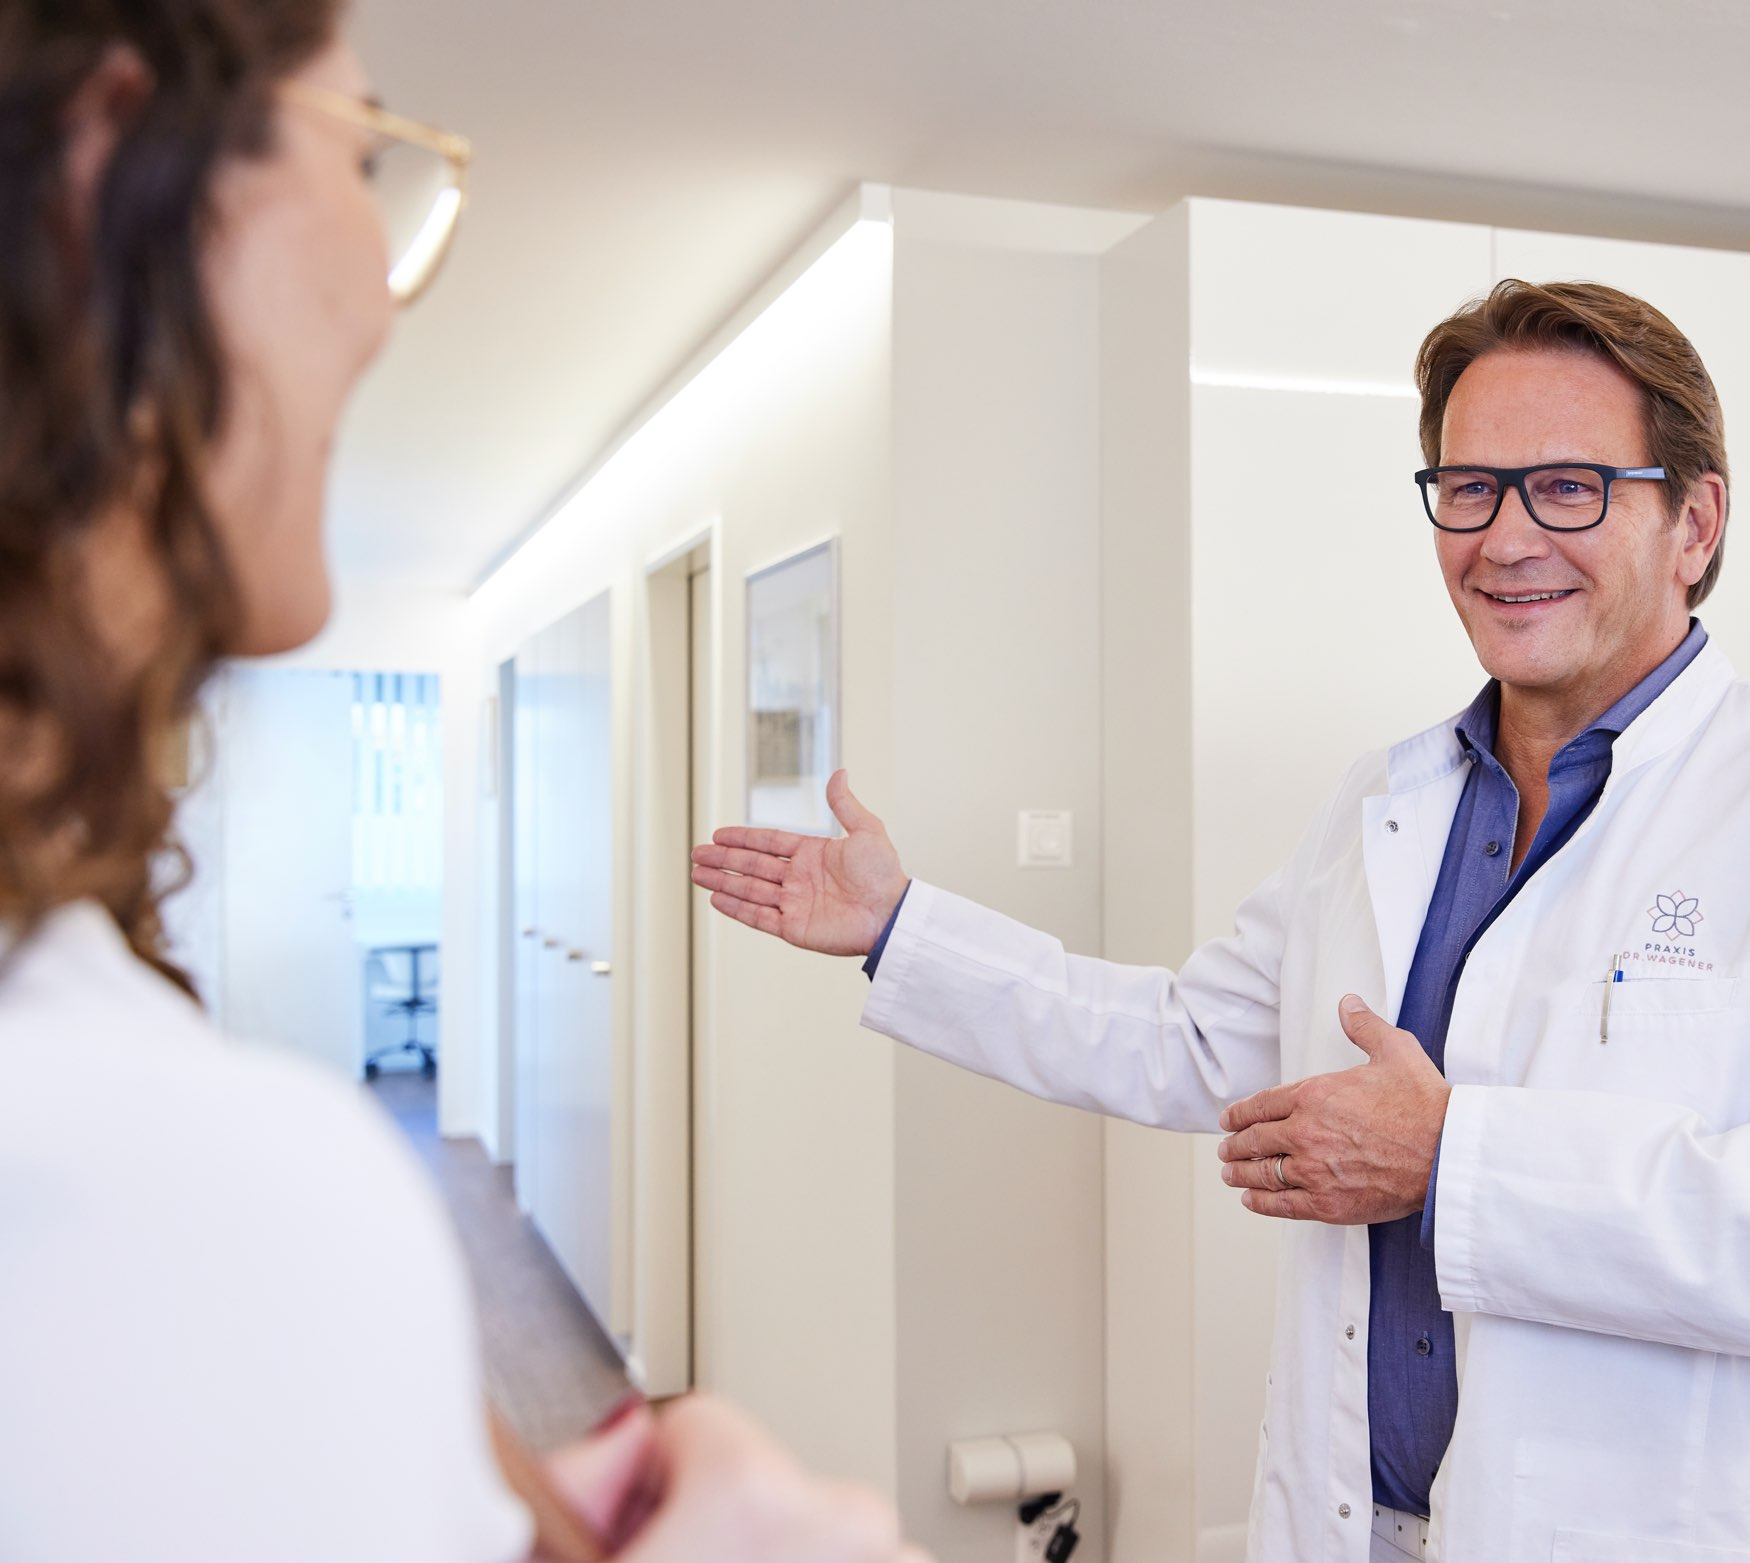 Hausarzt Dr. med. Michael Wagener begrüsst Patientin